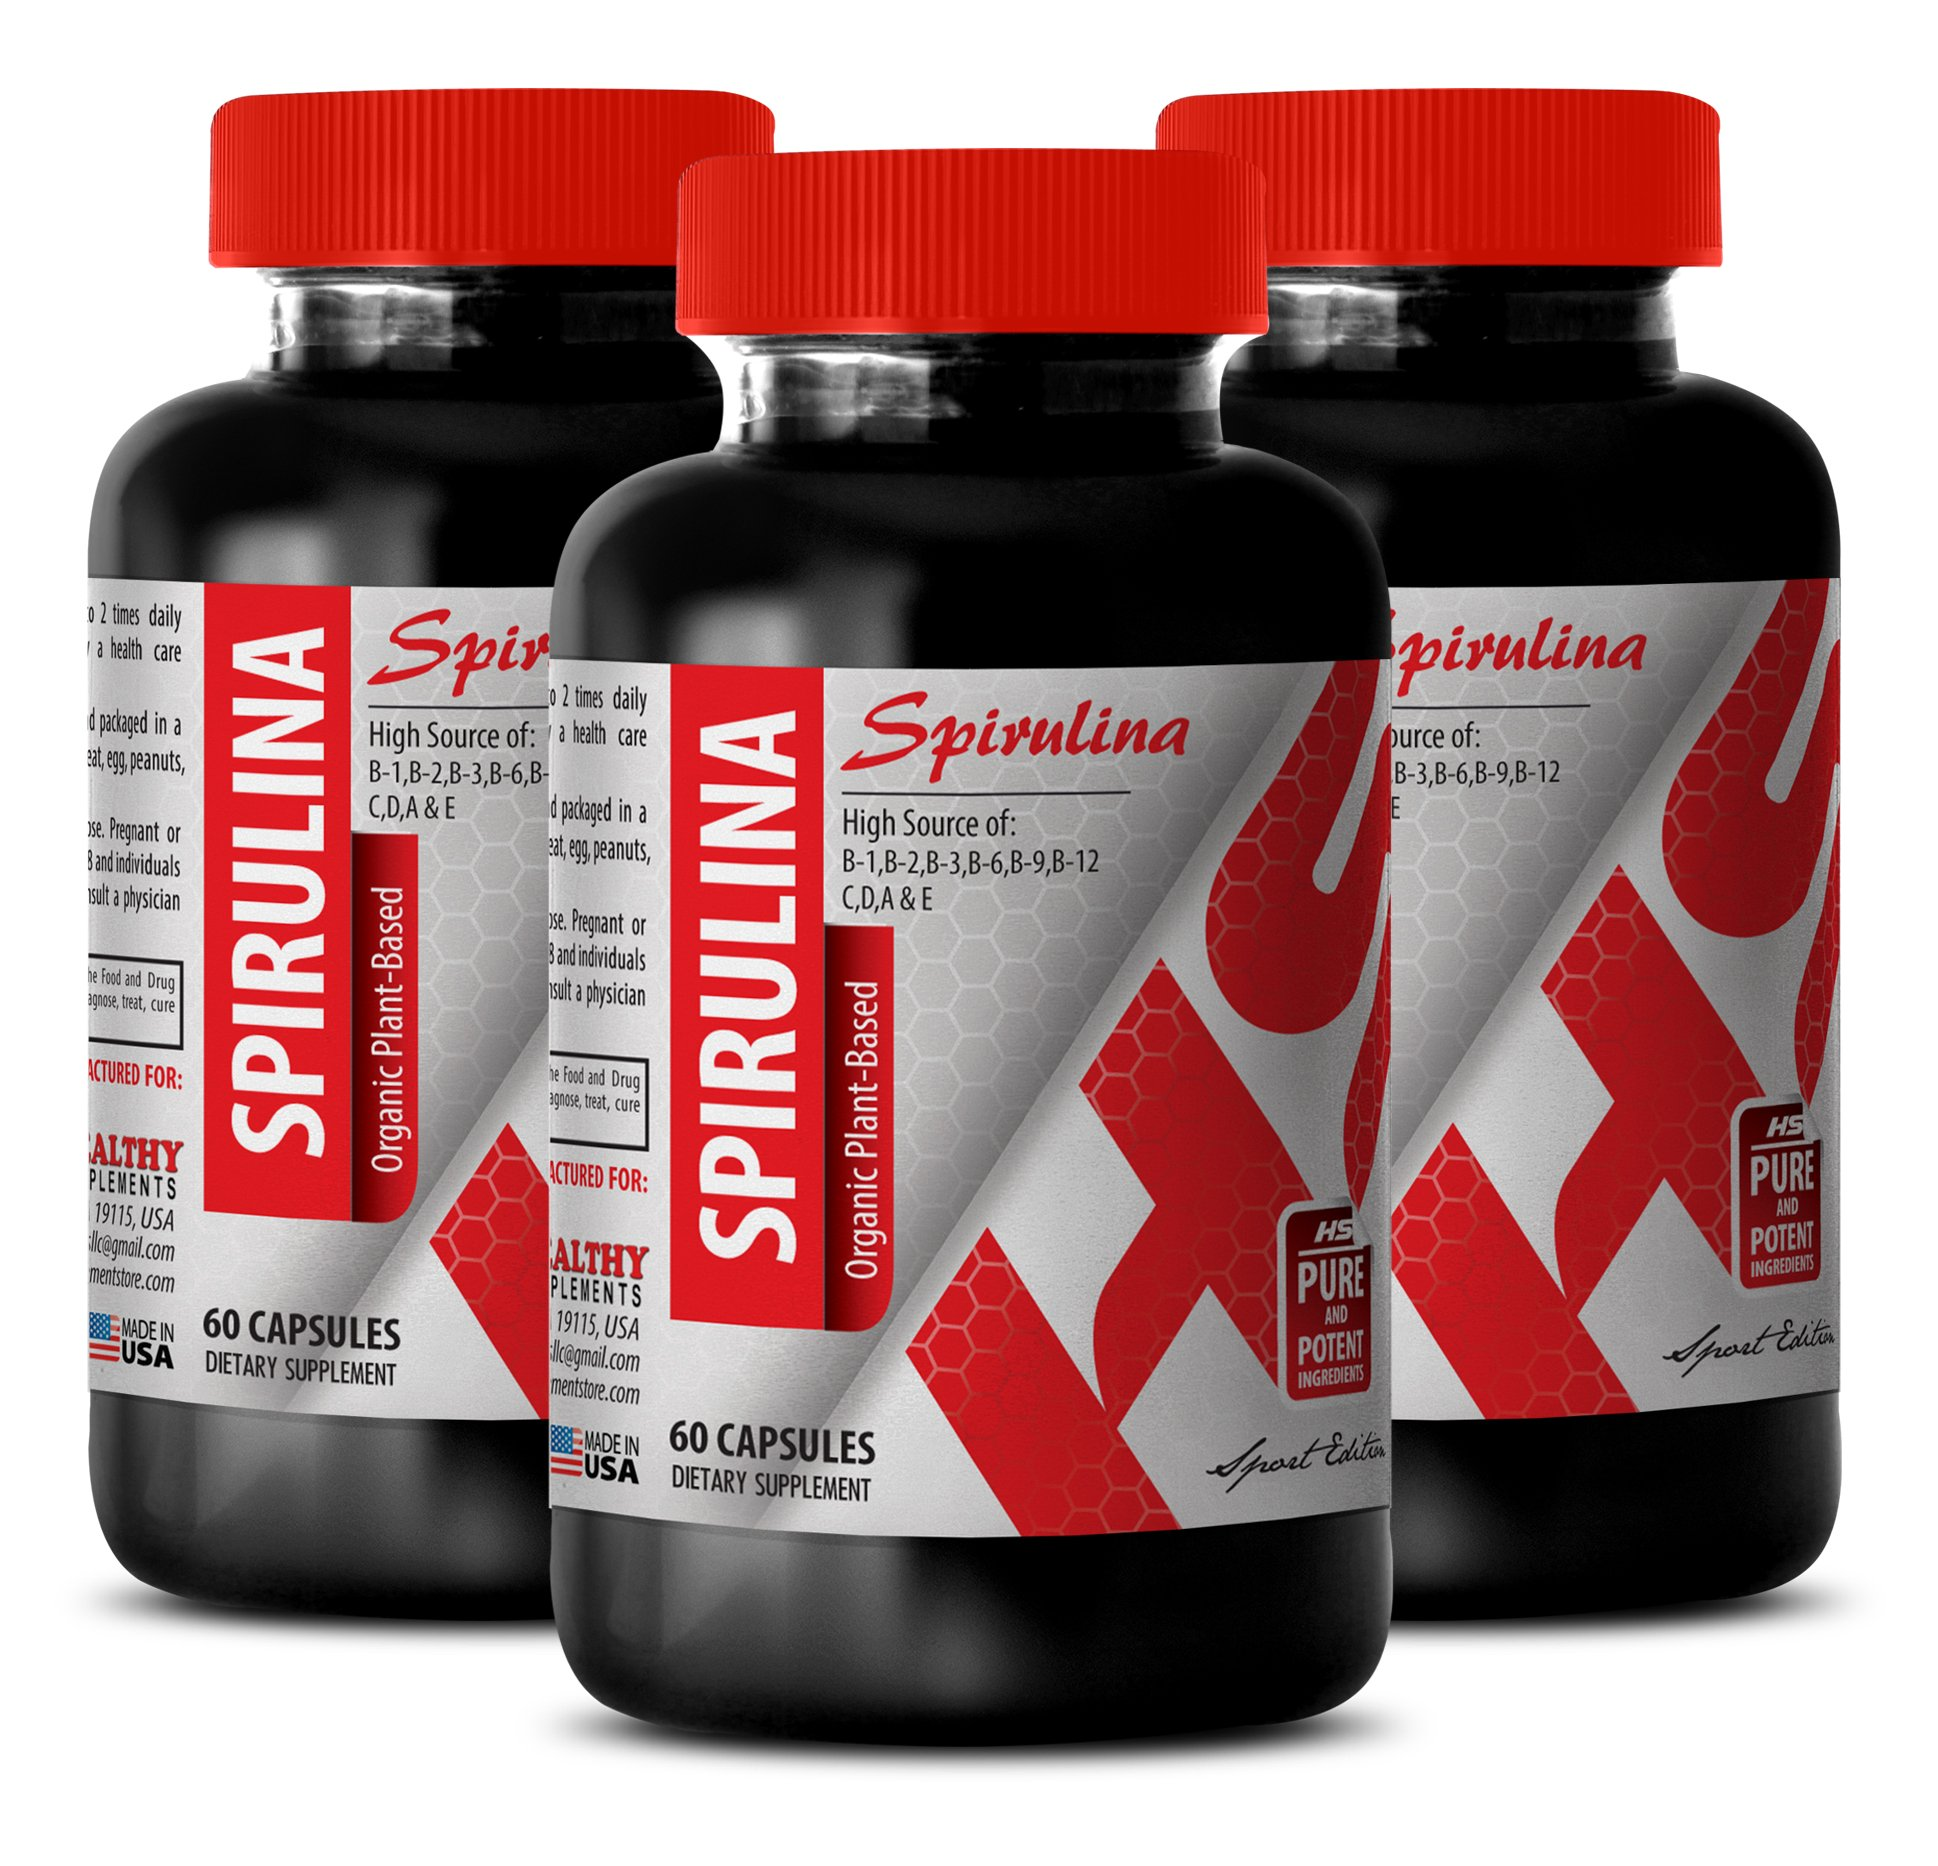 Spirulina supplements 500mg - SPIRULINA ORGANIC PLANT-BASED 500 MG - improve digestive health (3 Bottles)